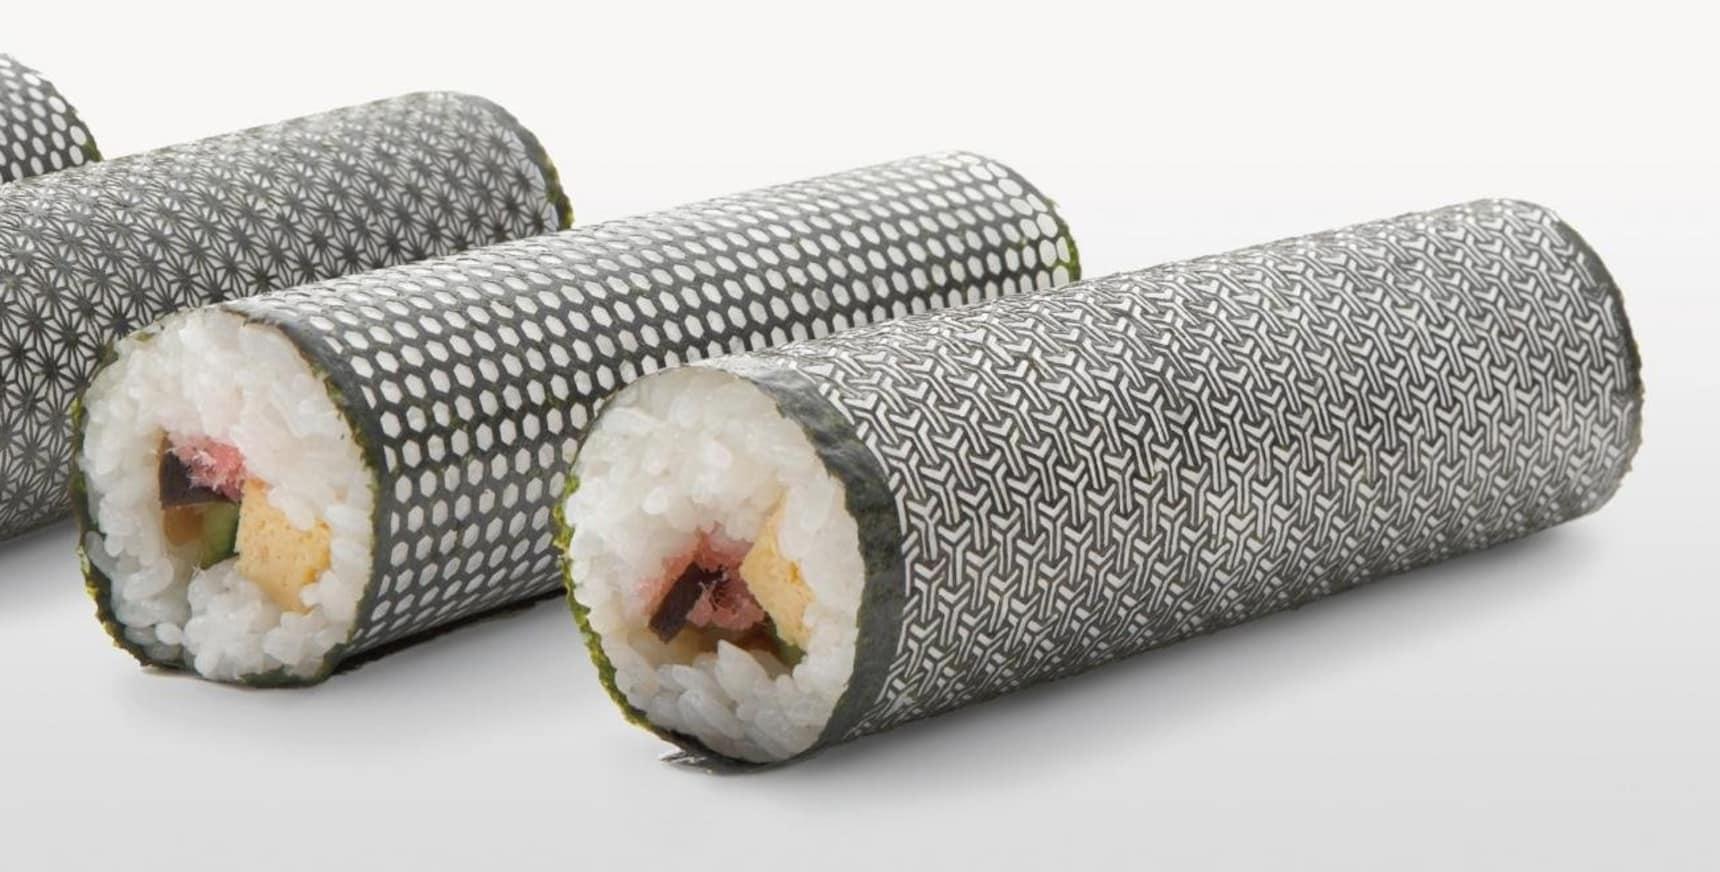 Laser-Cut Seaweed Makes Beautiful Sushi